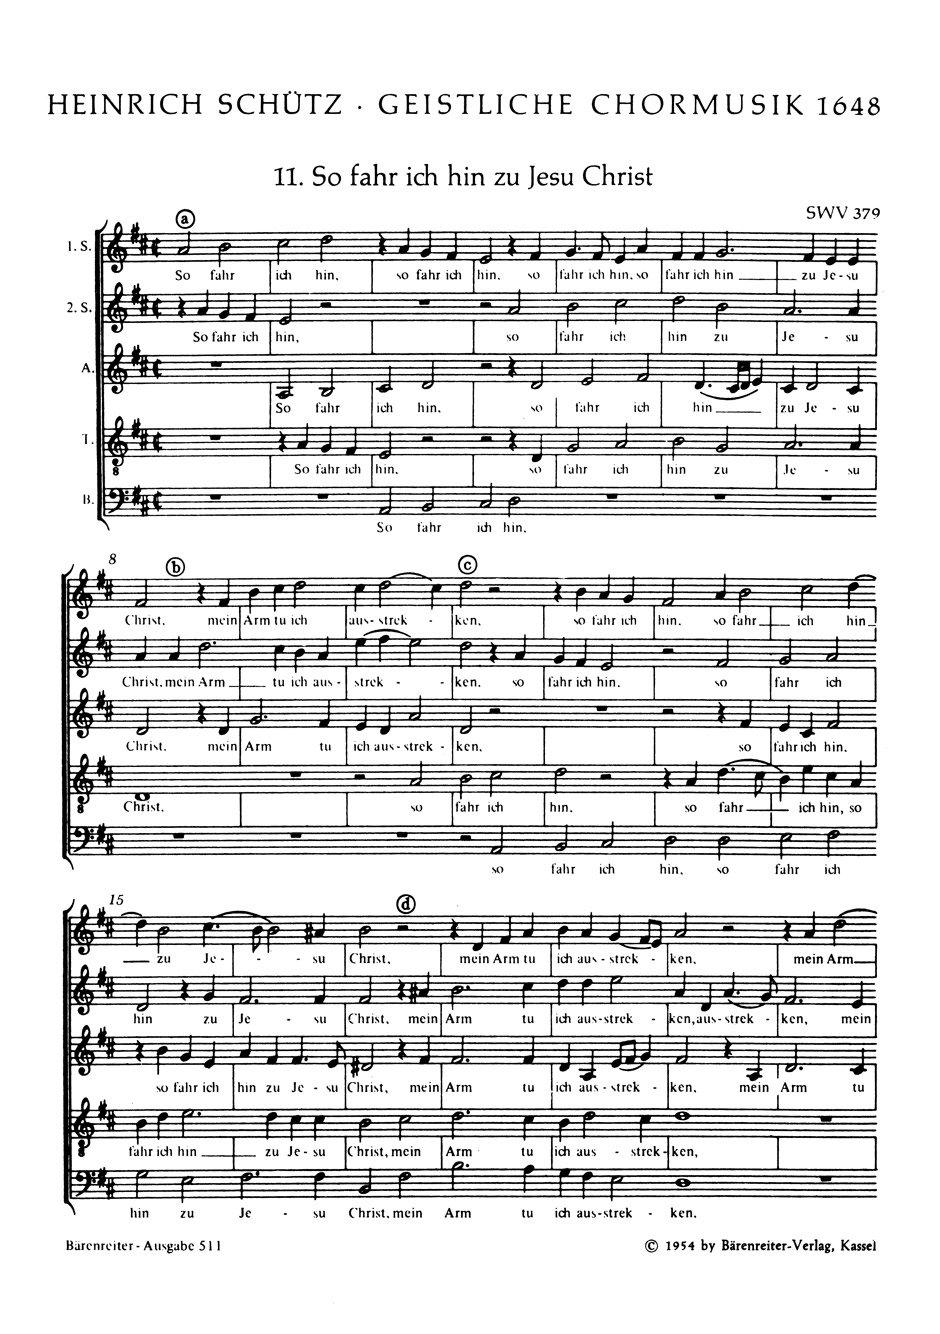 In Paradisum Dan Forrest SATB Divisi CHOIR Learn to Play MUSIC CHORAL SCORE